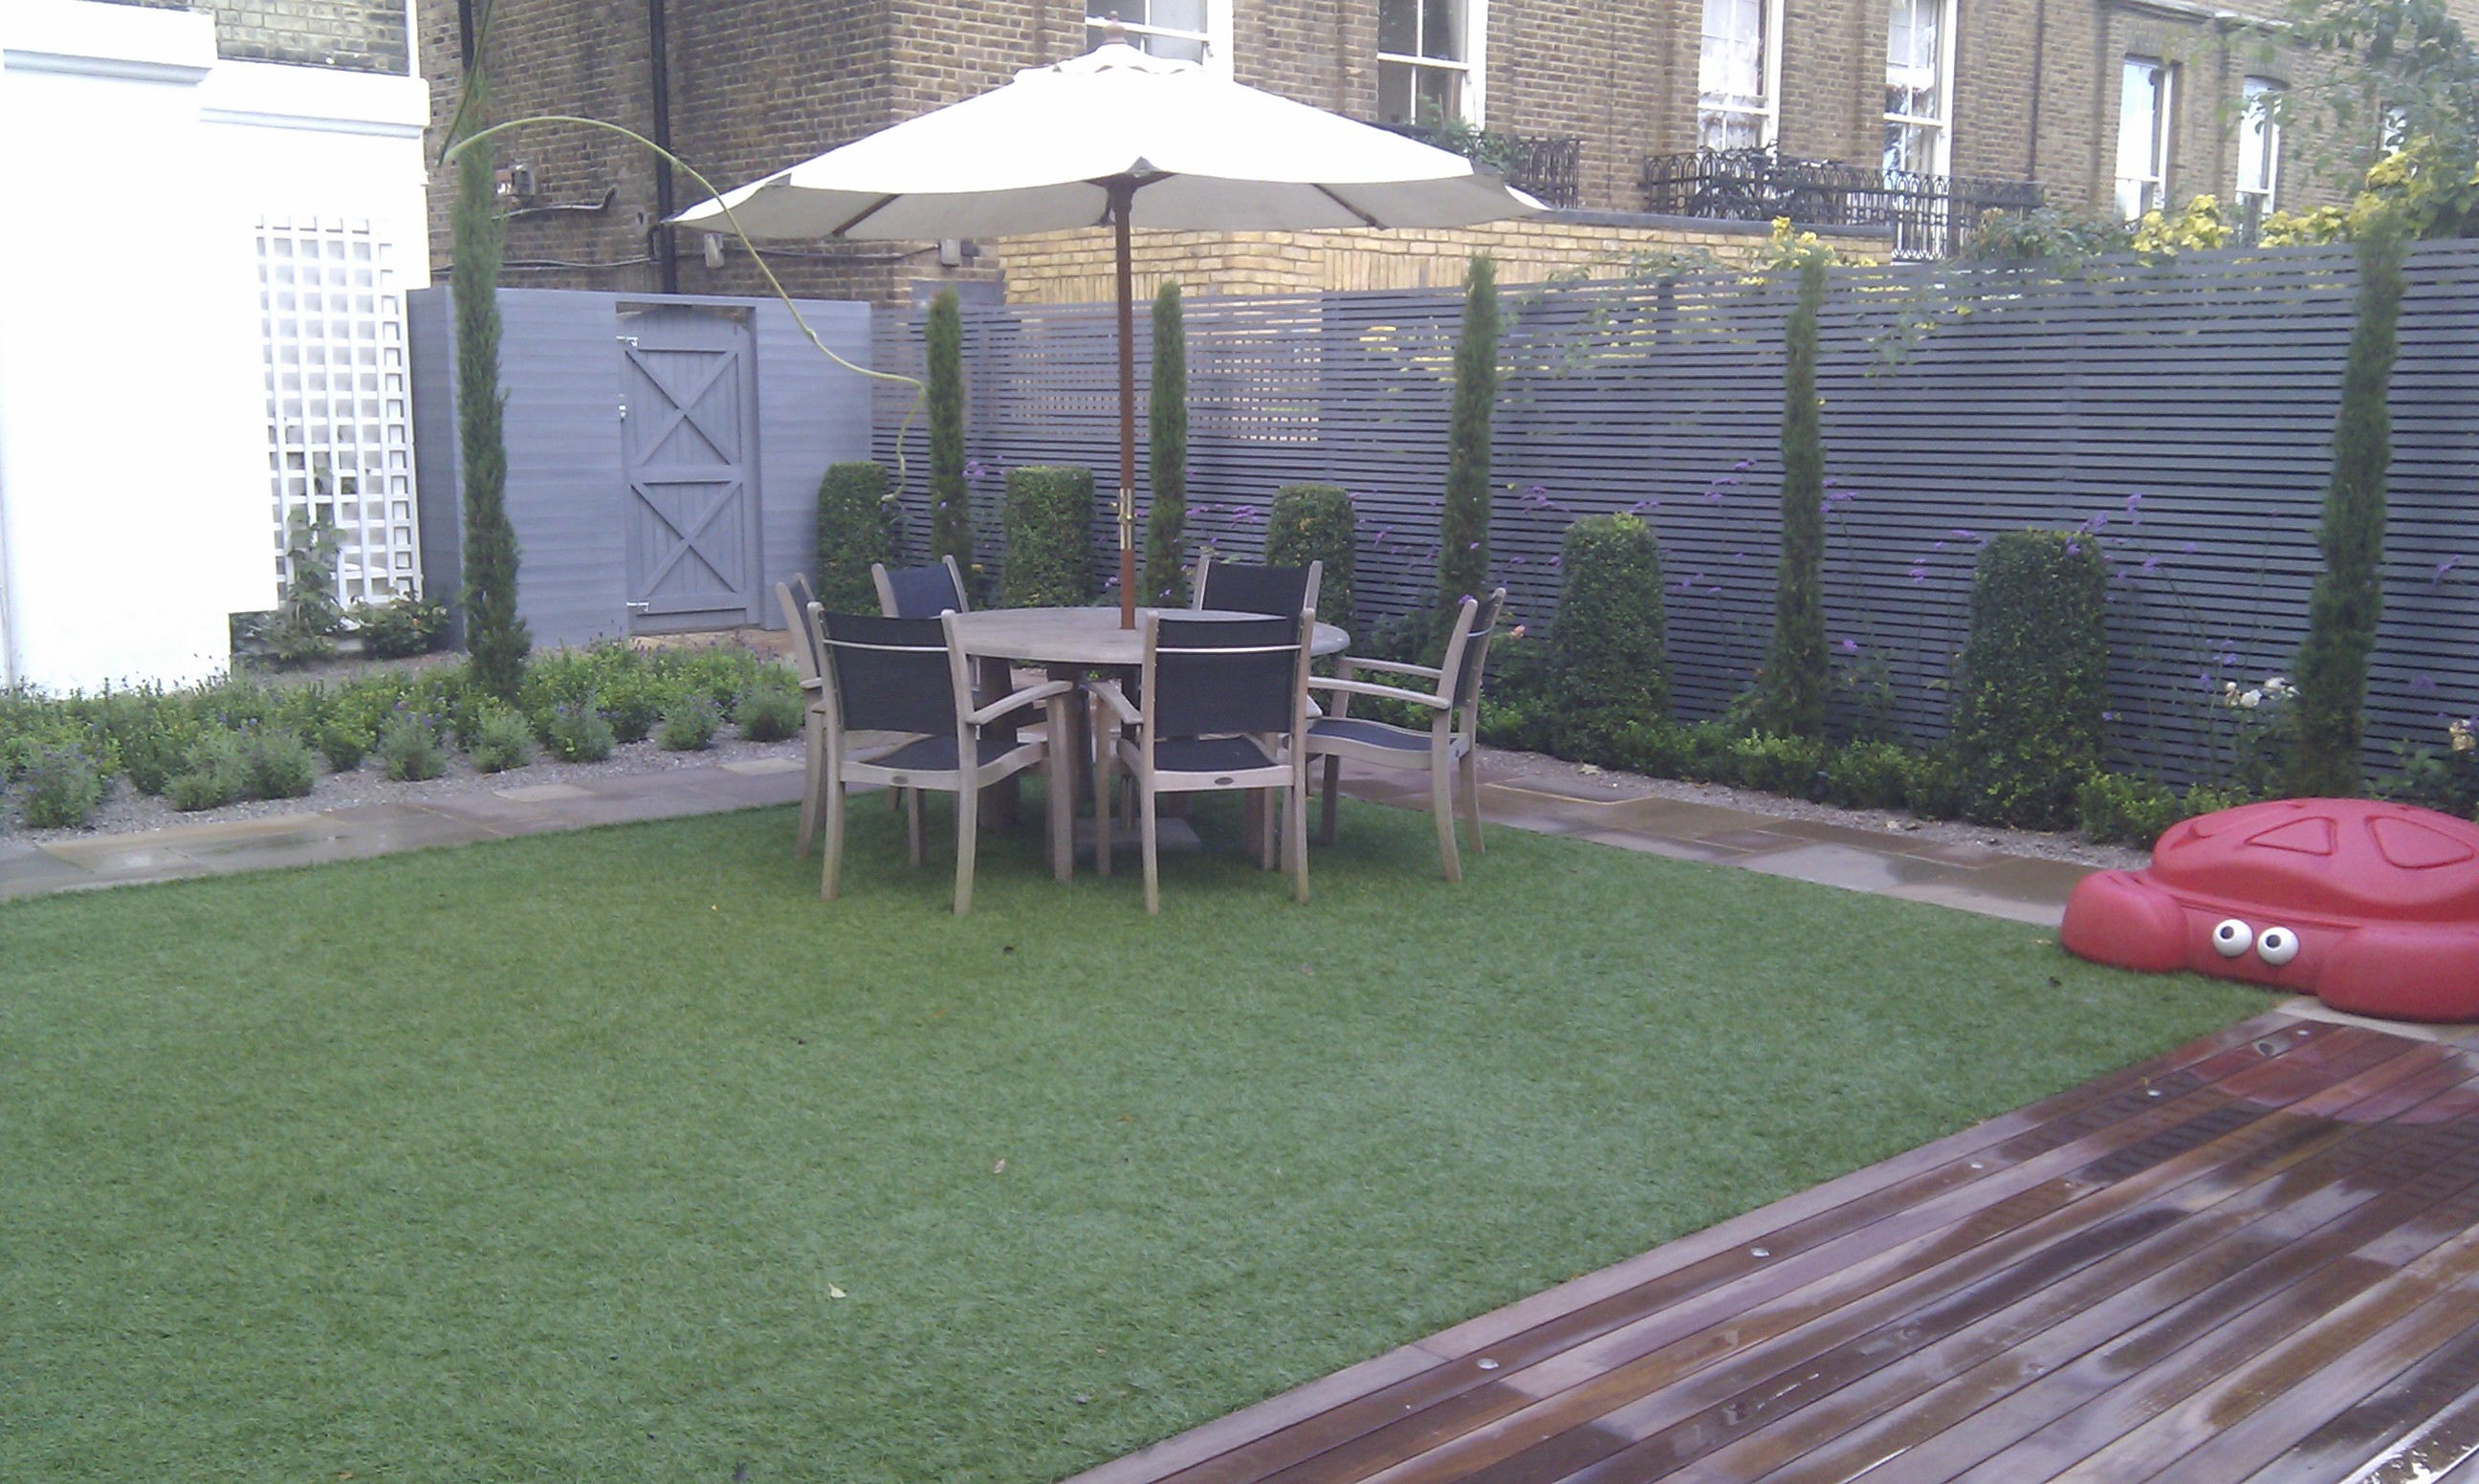 modern garden design london slatted grey privacy screen sandstone paving easy grass balau hardwood decking (33)